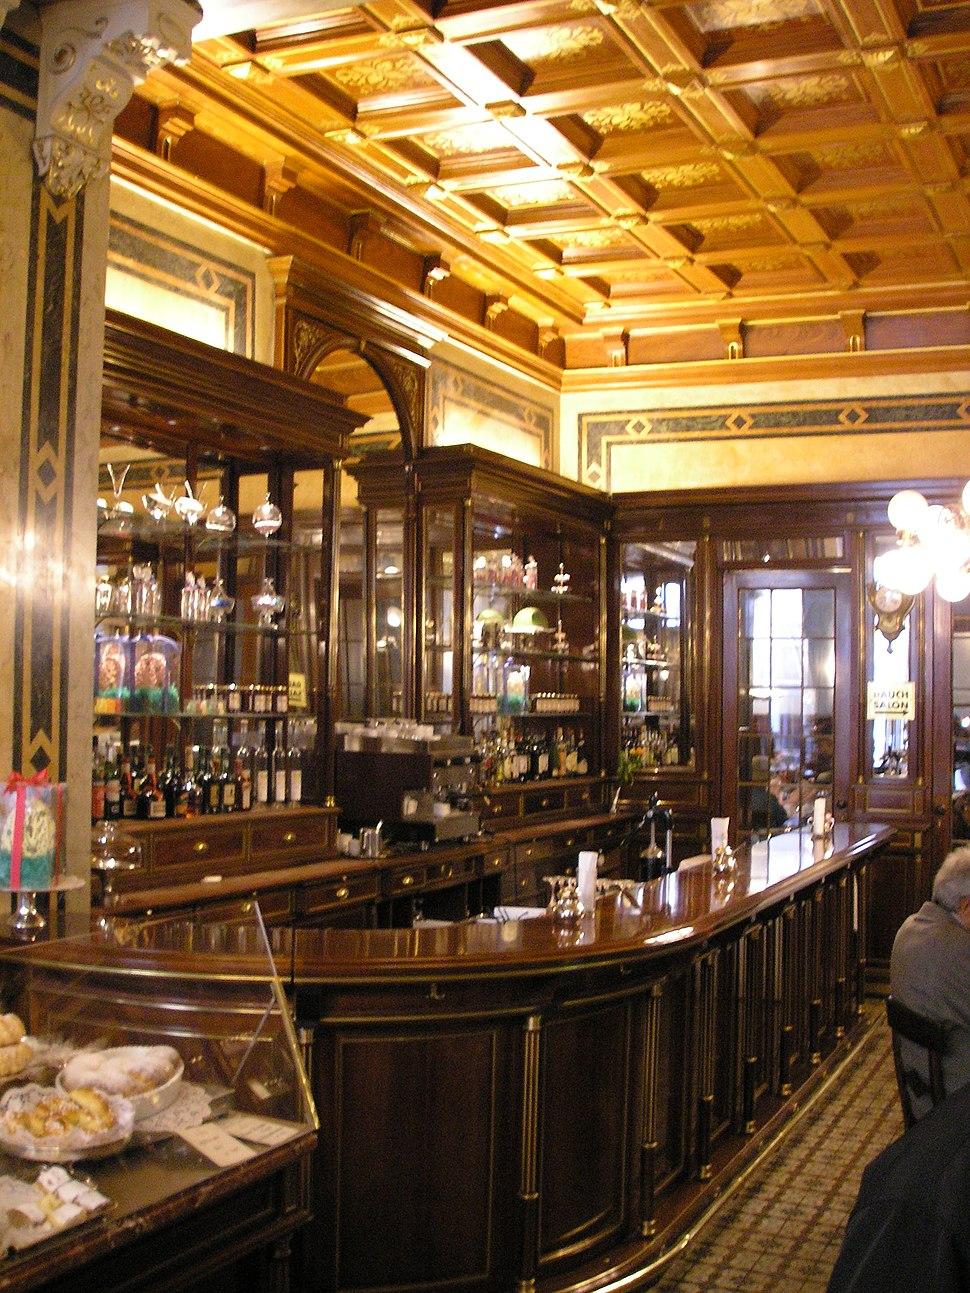 Caf%C3%A9 Demel interior4, Vienna